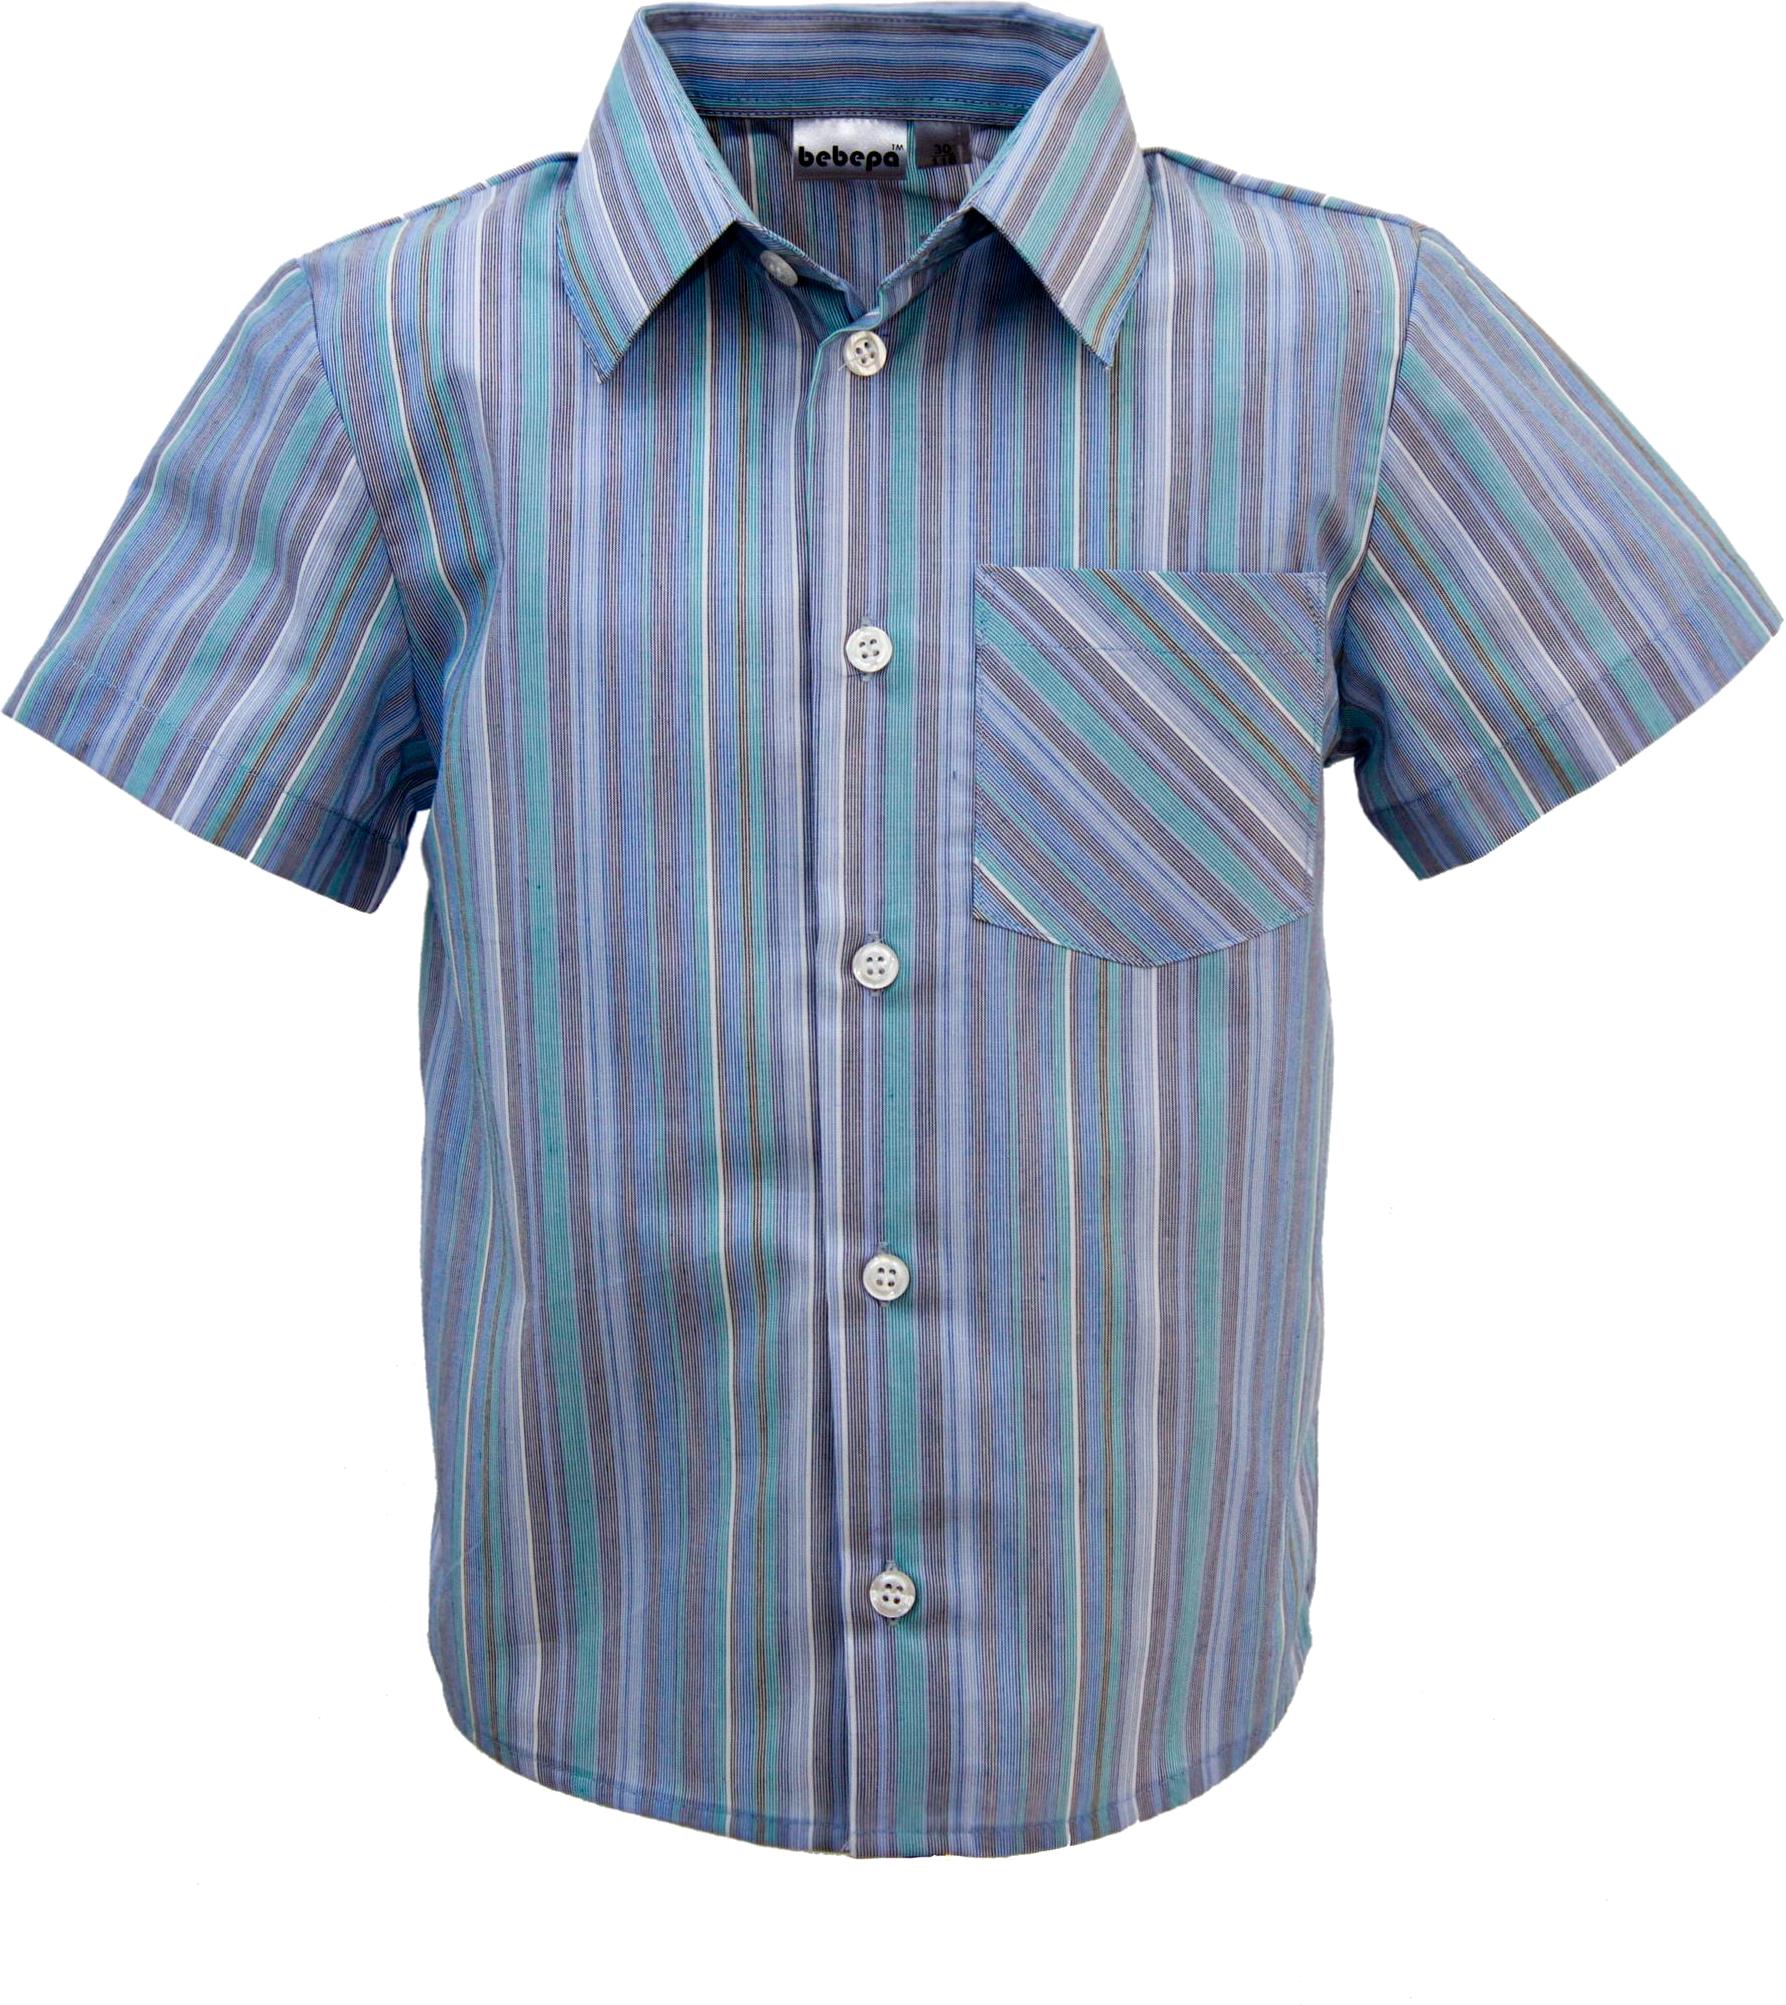 Half Strip Shirt Png Image Purepng Free Transparent Cc0 Png